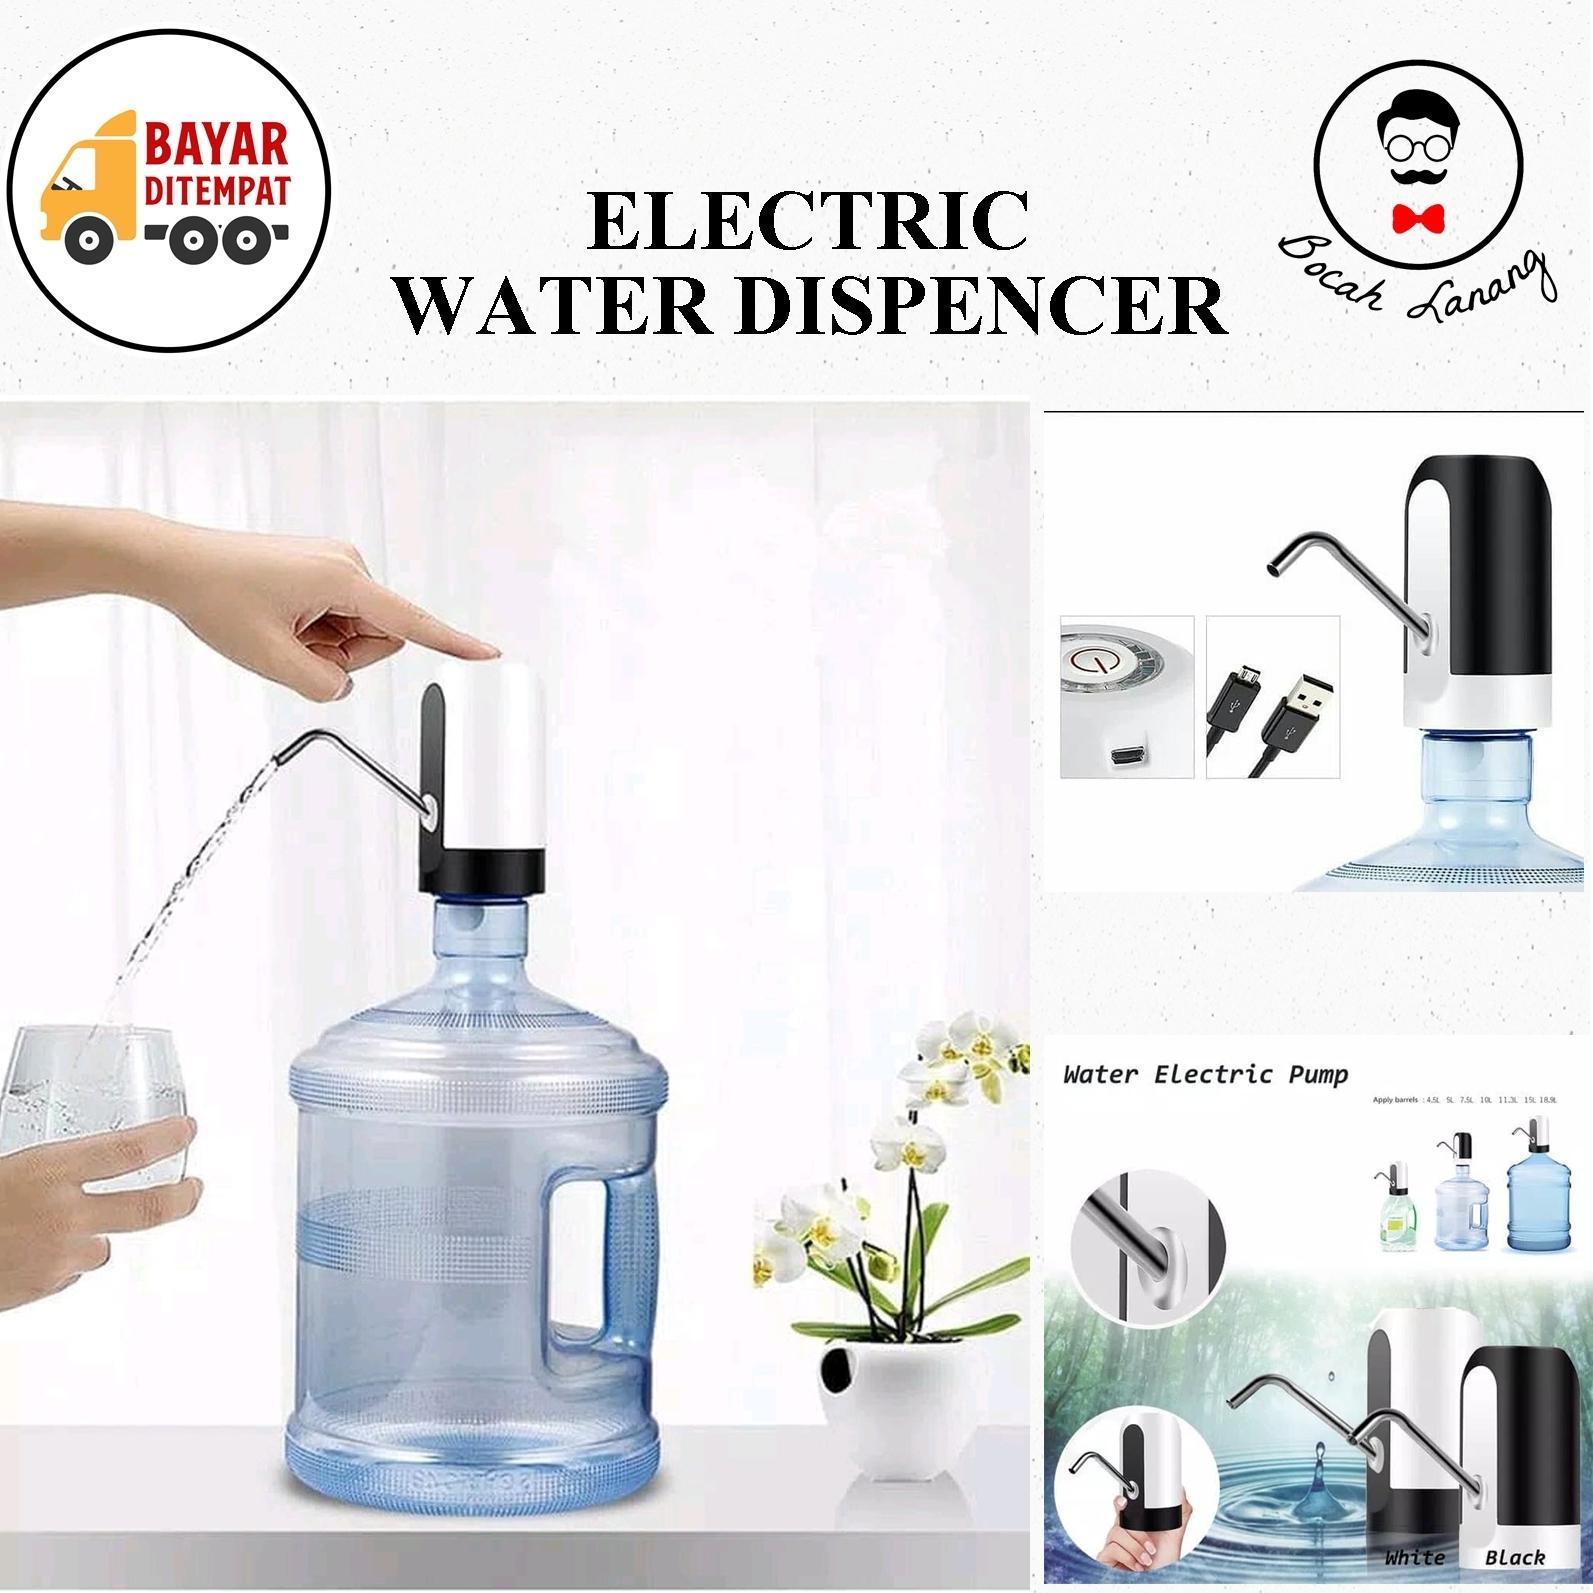 Jual dispenser galon air .